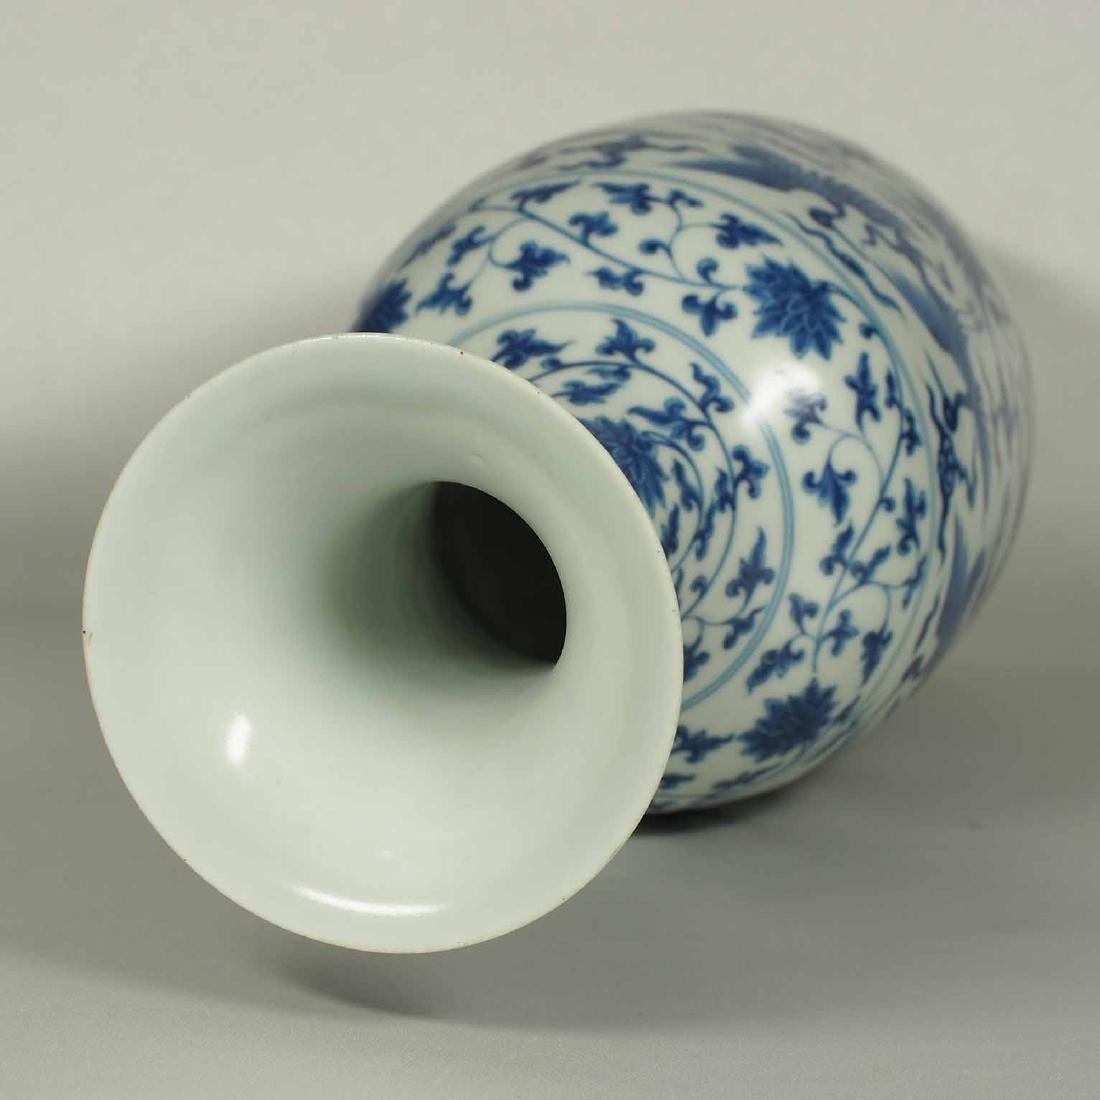 Vase with Flying Cranes Design, Ming Dynasty - 5